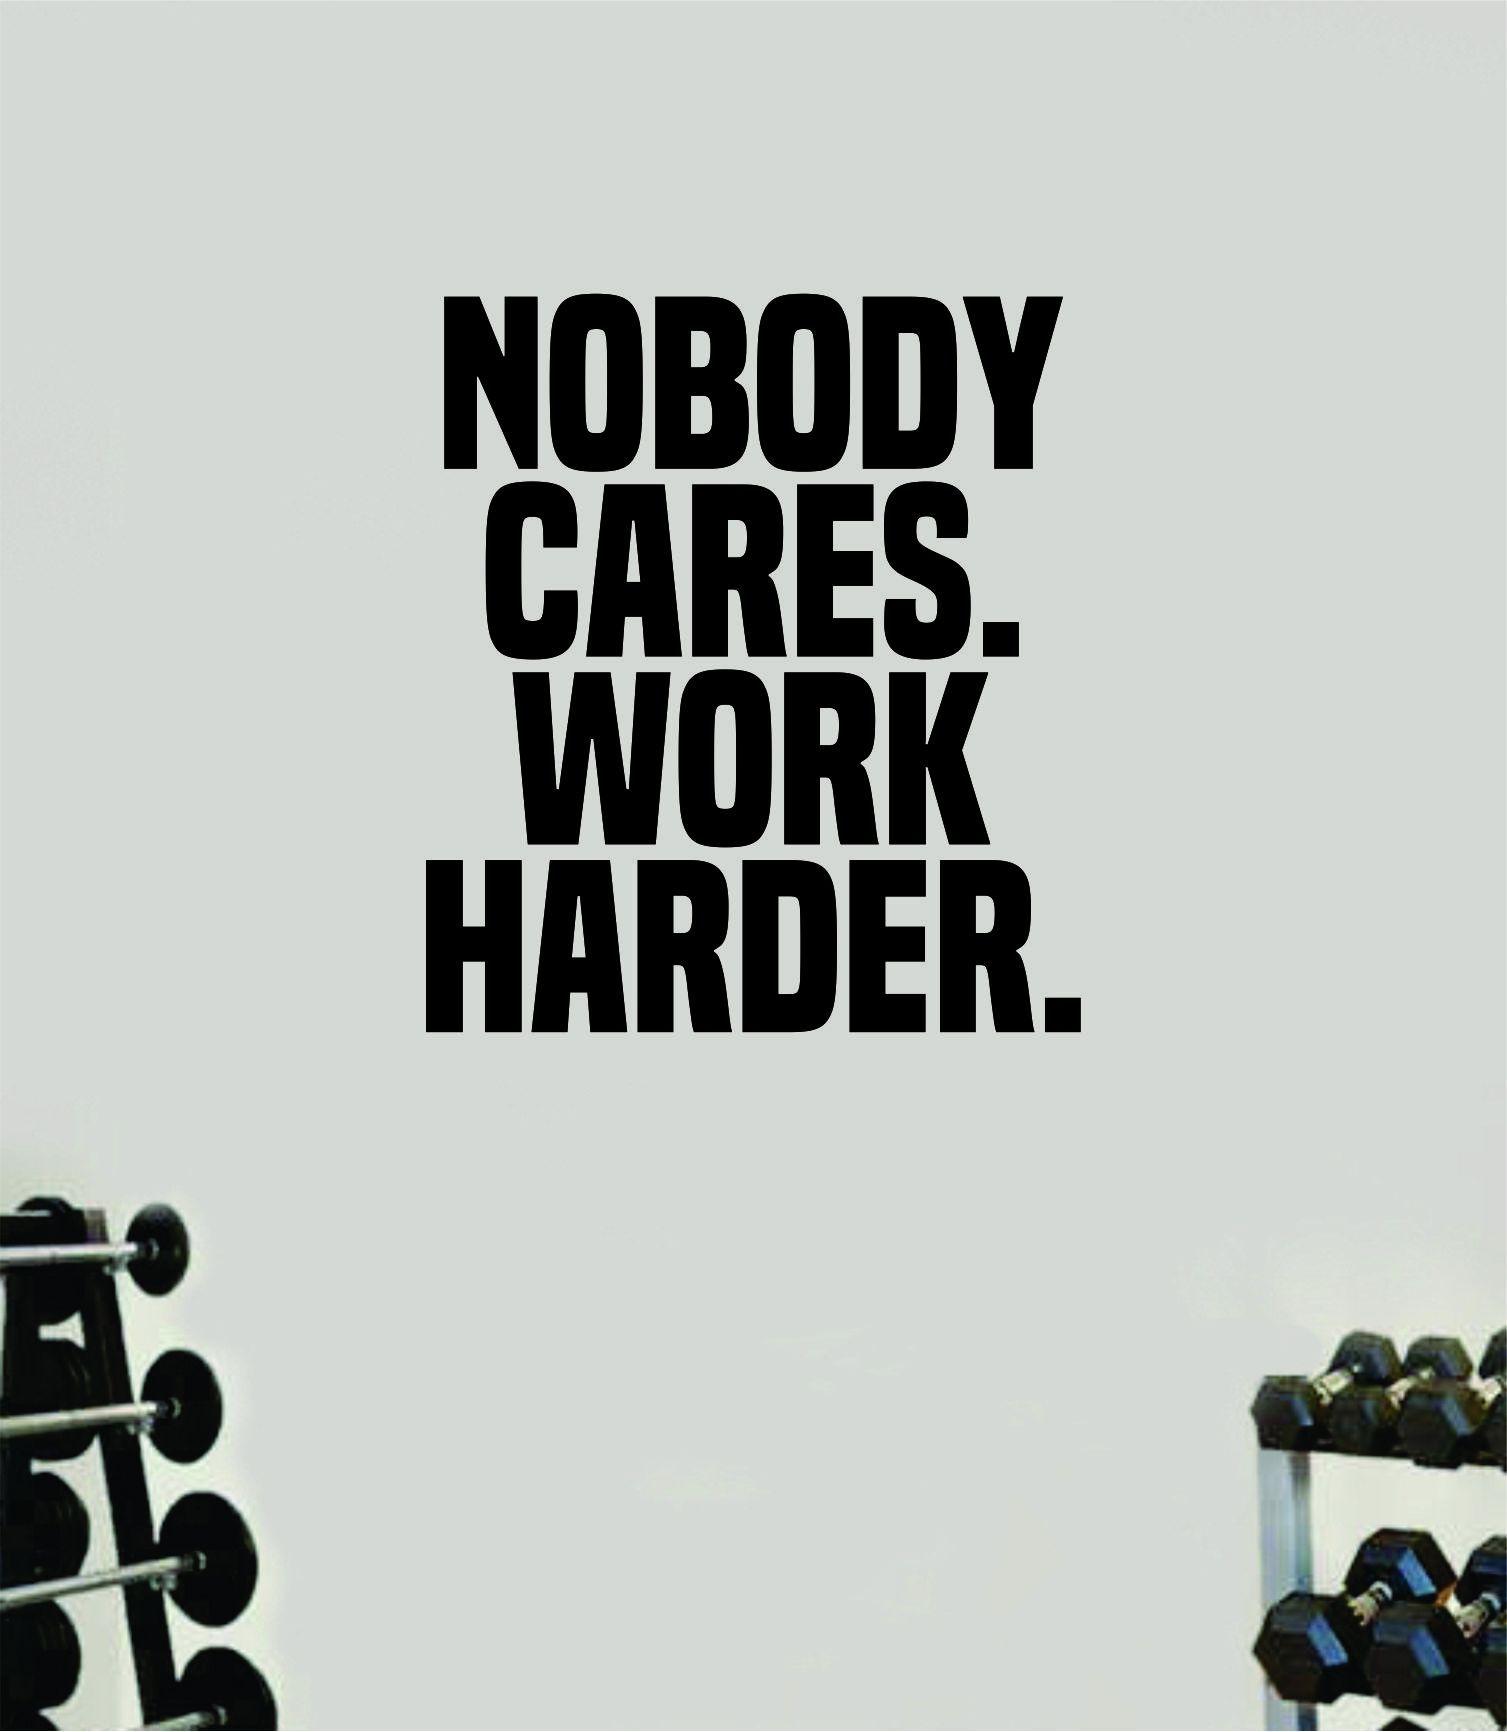 Photo of Niemand kümmert sich um die Arbeit härter V2 Gym Zitat Fitness Gesundheit Work Out Aufkleber Aufkleber Vinyl Kunst Wand Raum Dekor Teen Motivation Inspirational Girls Lift – lebendiges Blau